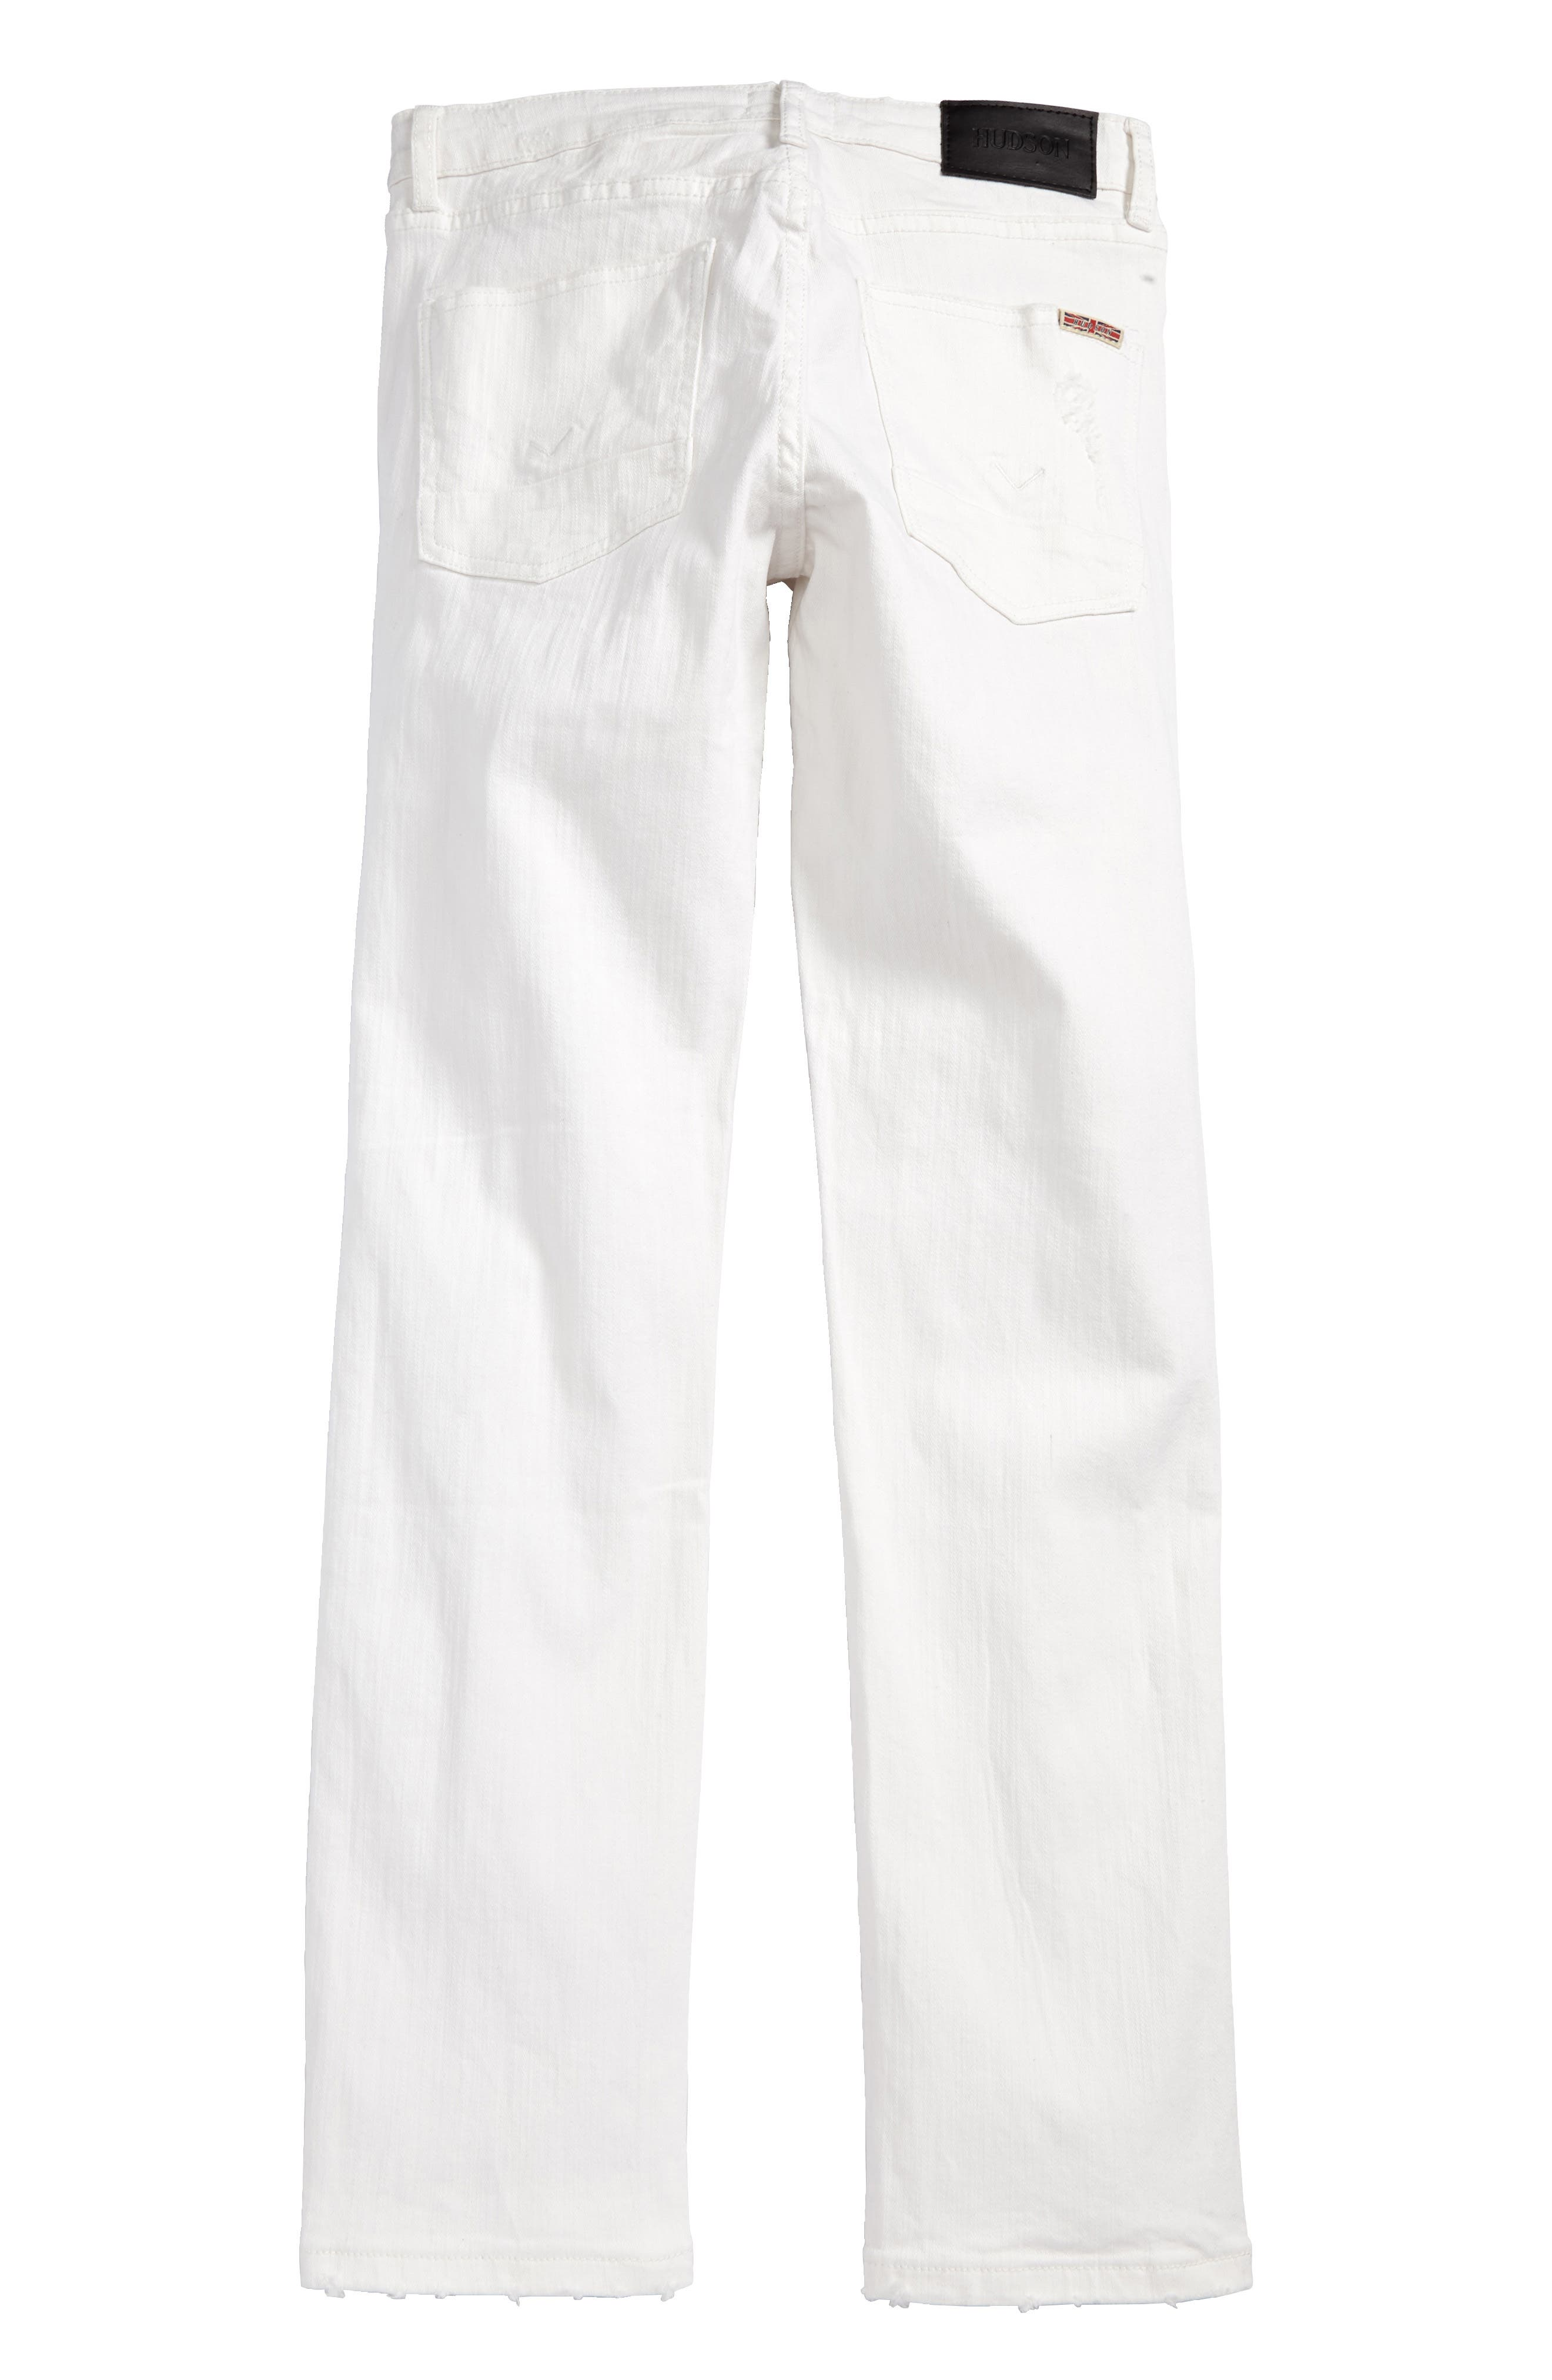 Jagger Slim Fit Straight Leg Jeans,                             Alternate thumbnail 2, color,                             116